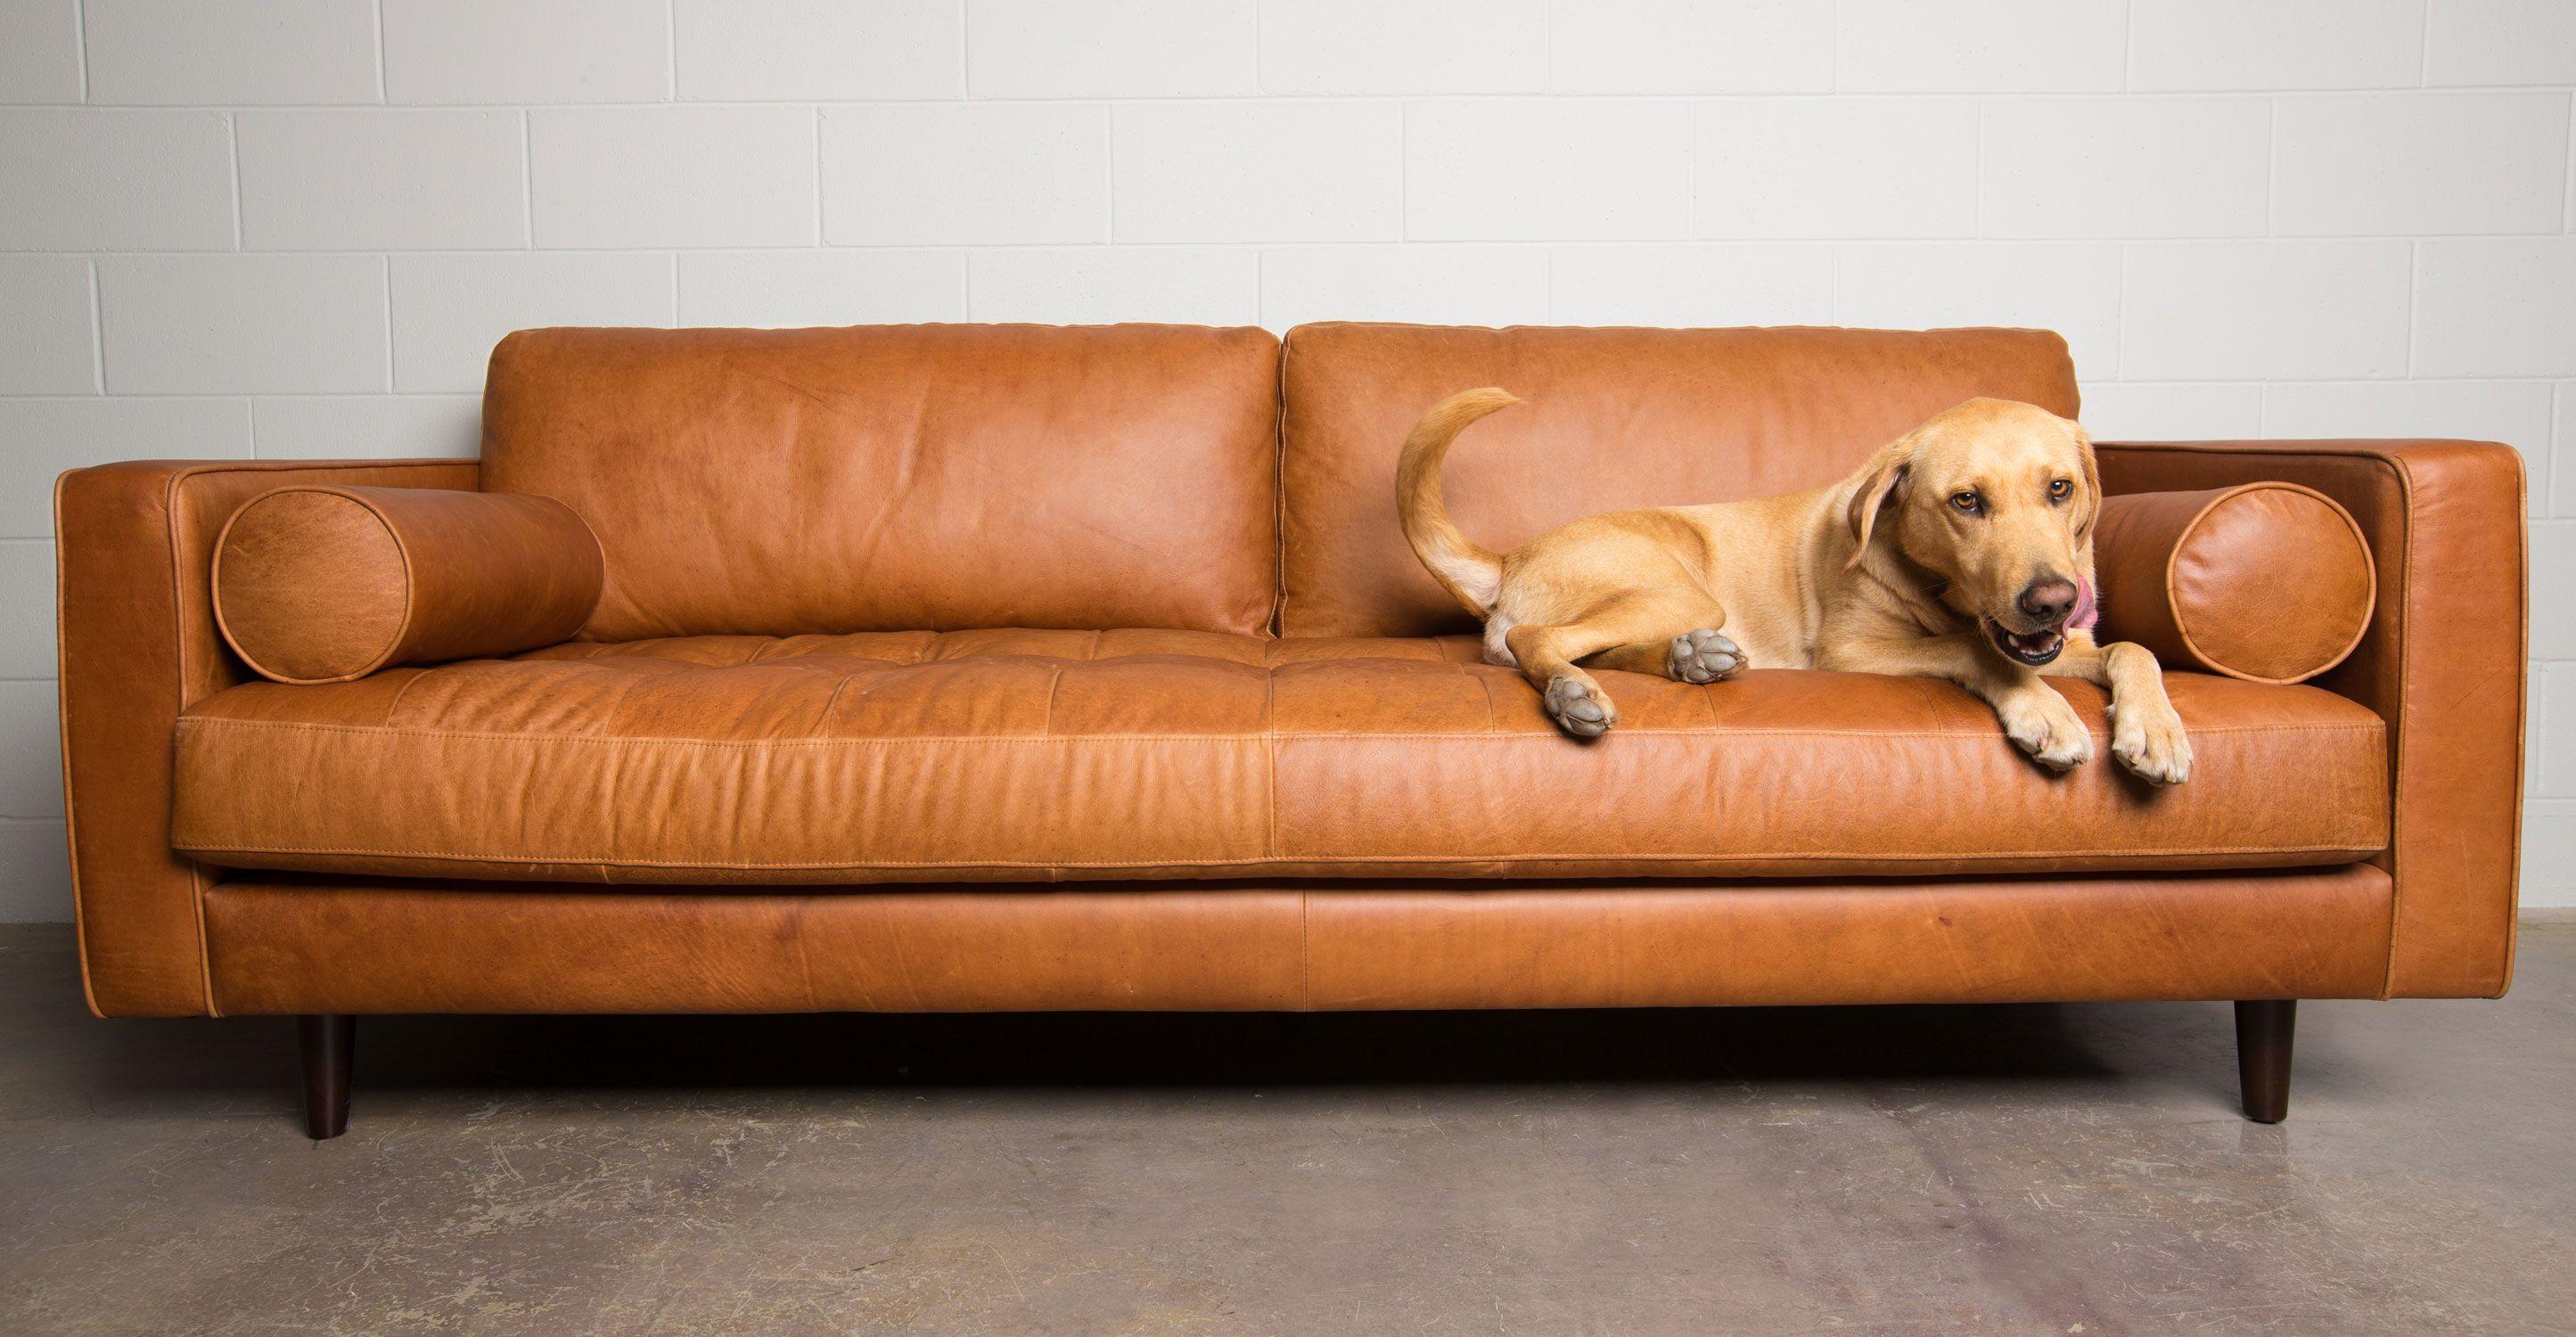 scandinavian leather furniture. Sven Charme Tan Sofa - Sofas \u0026 Ottomans Bryght | Modern, Mid-Century Scandinavian Leather Furniture A